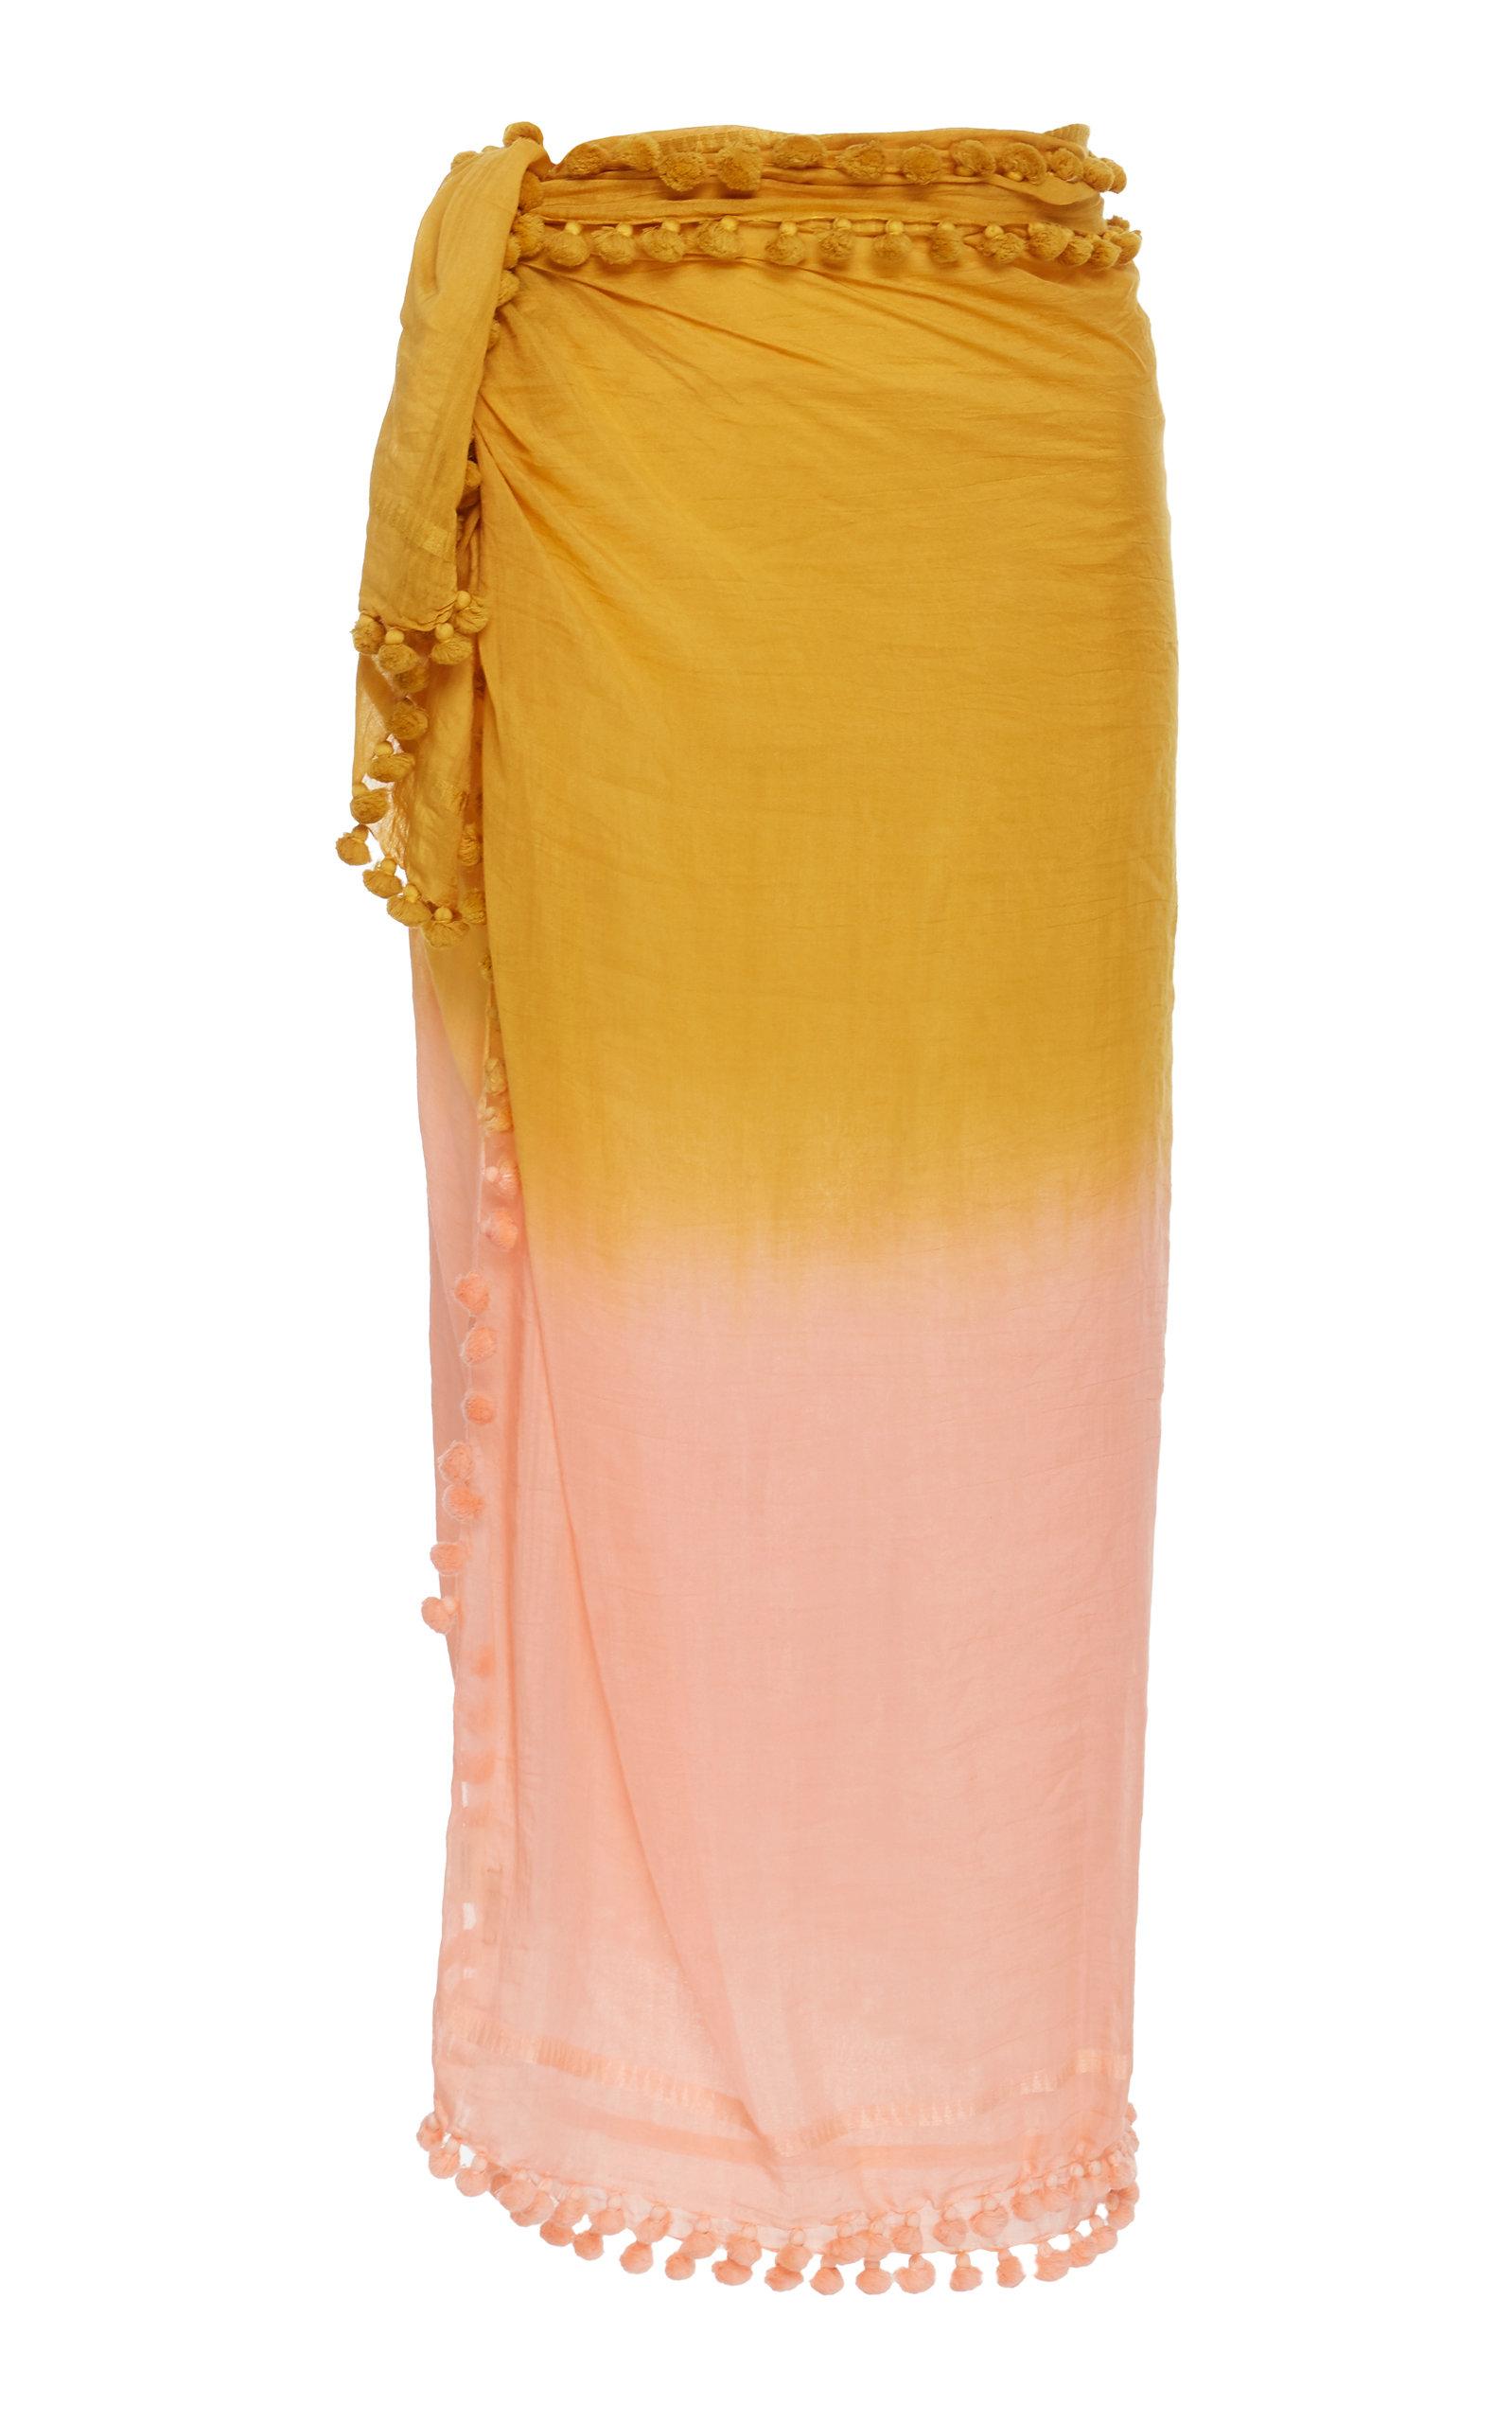 MATTA Dupatta Ombré Cotton And Silk Shawl in Yellow